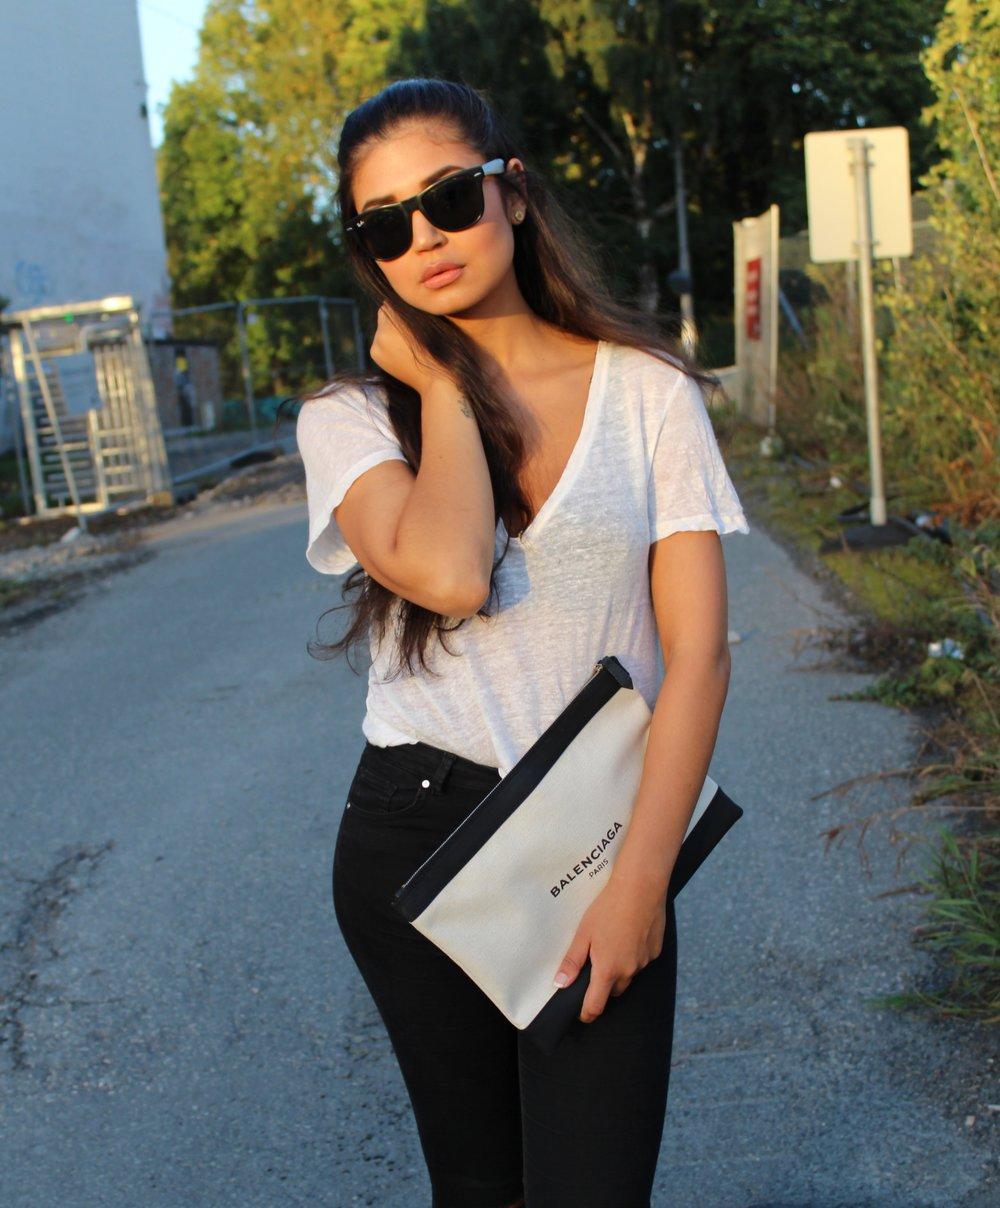 Clutch/ Balenciaga  Tshirt/ GinaTricot   Jeans/ Bikbok    Sandals/ Birkenstock    Sunglasses/ Raban  Bra/ Hankypanky   Earrings/ MarcJacobs